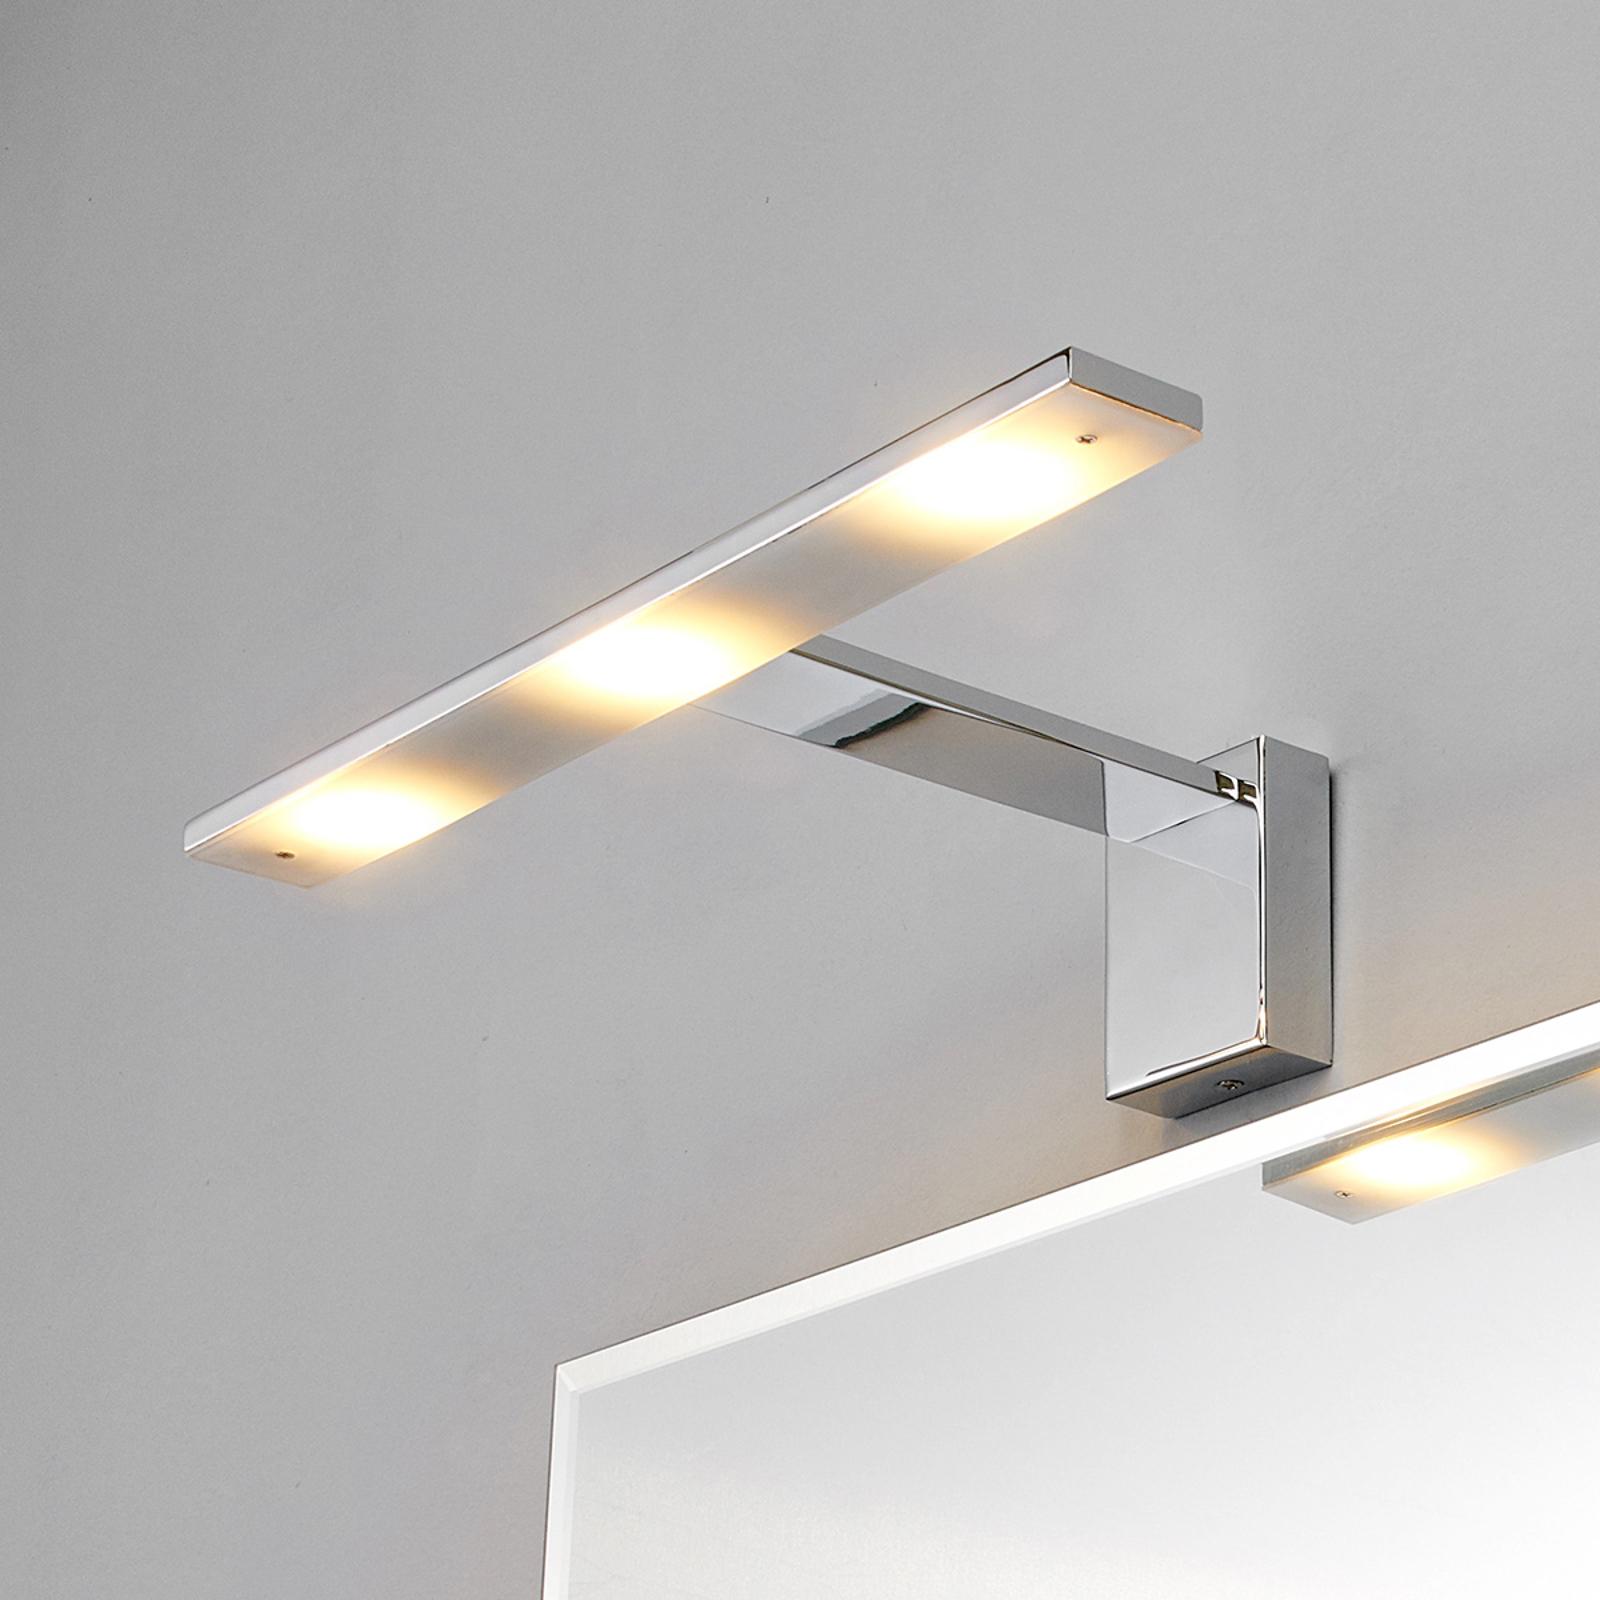 LED-Spiegelleuchte Lorik, chrom